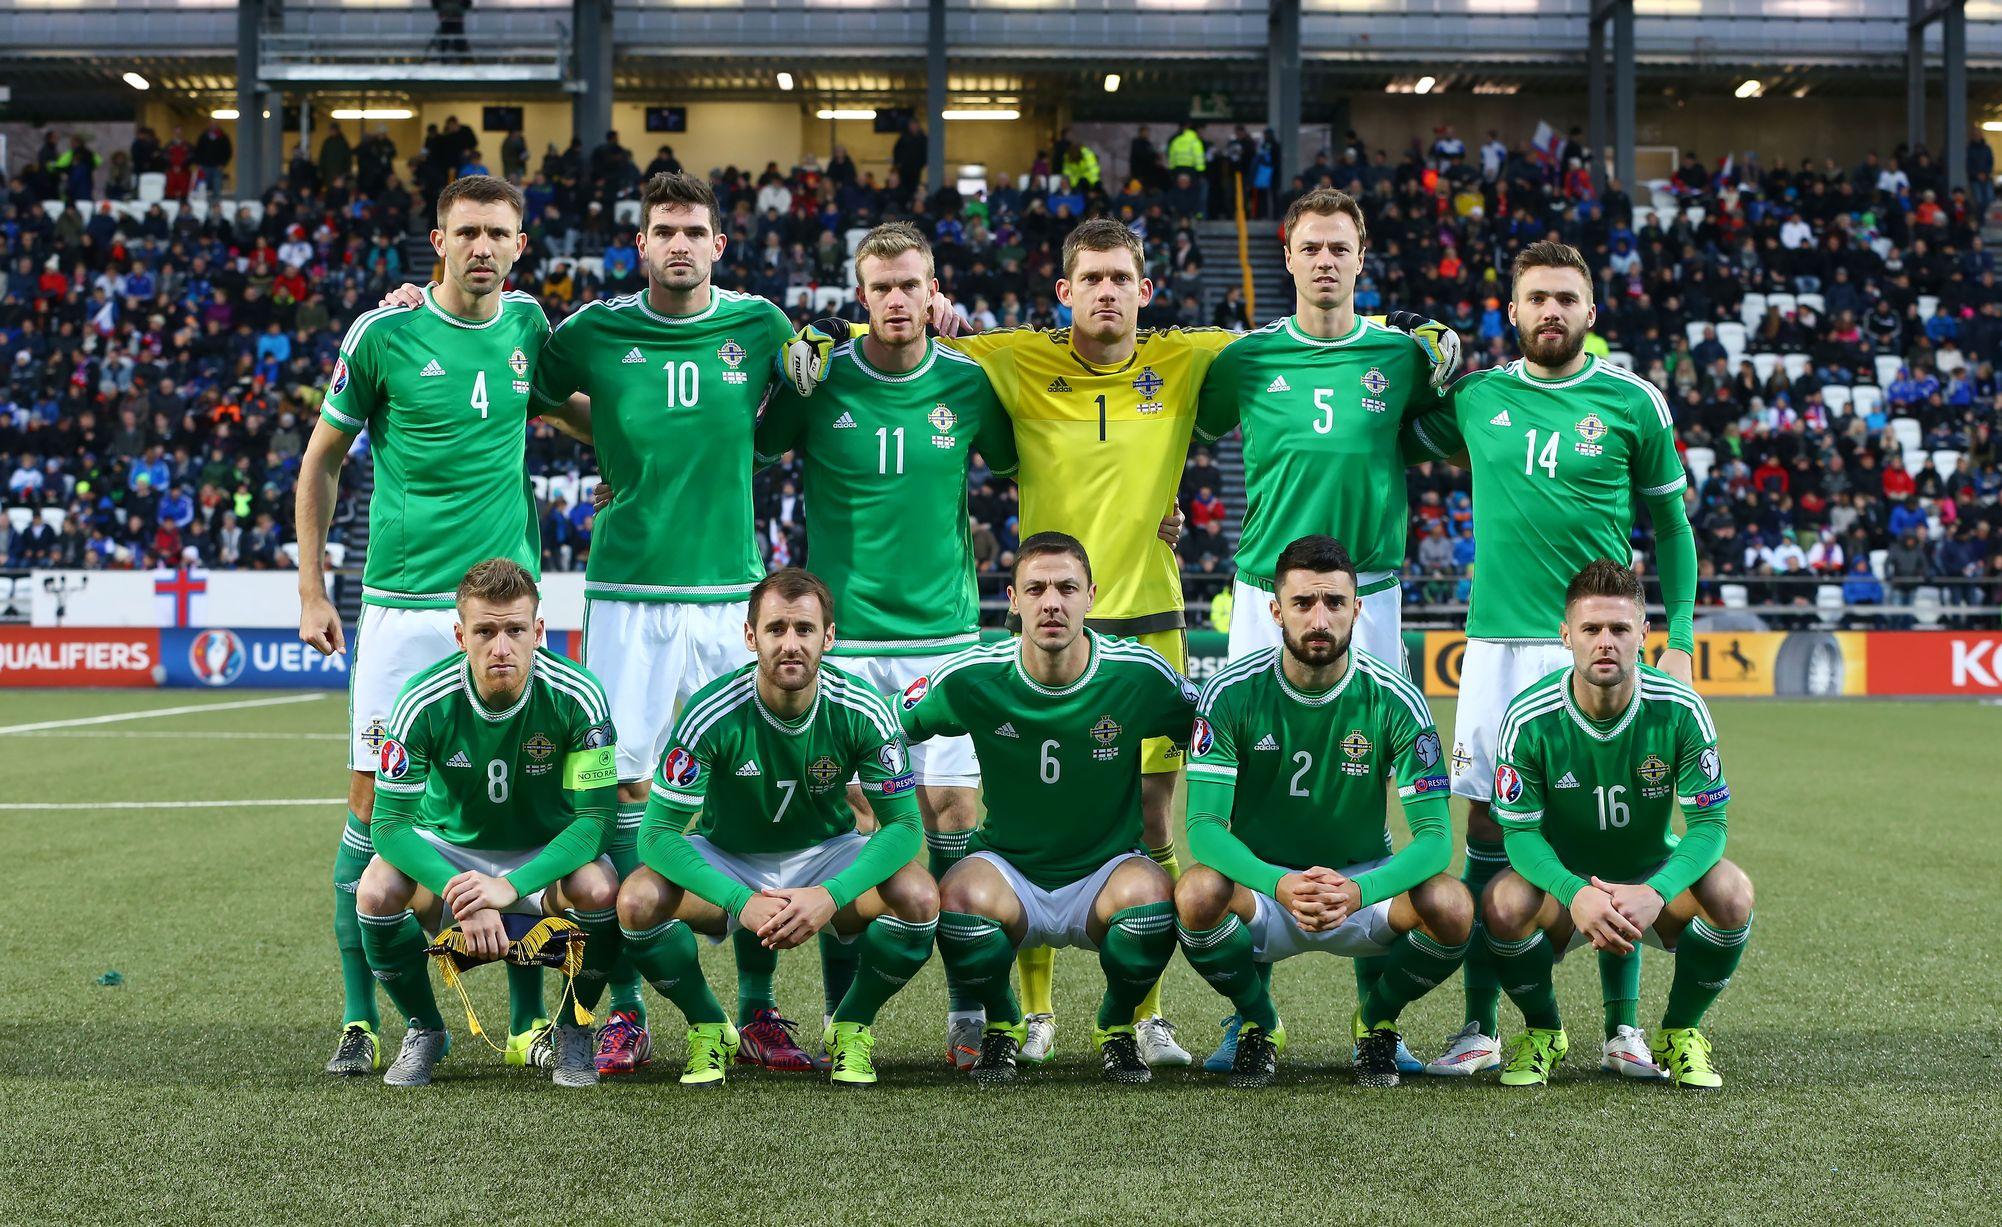 Euro 2016 - Northern Ireland team profile